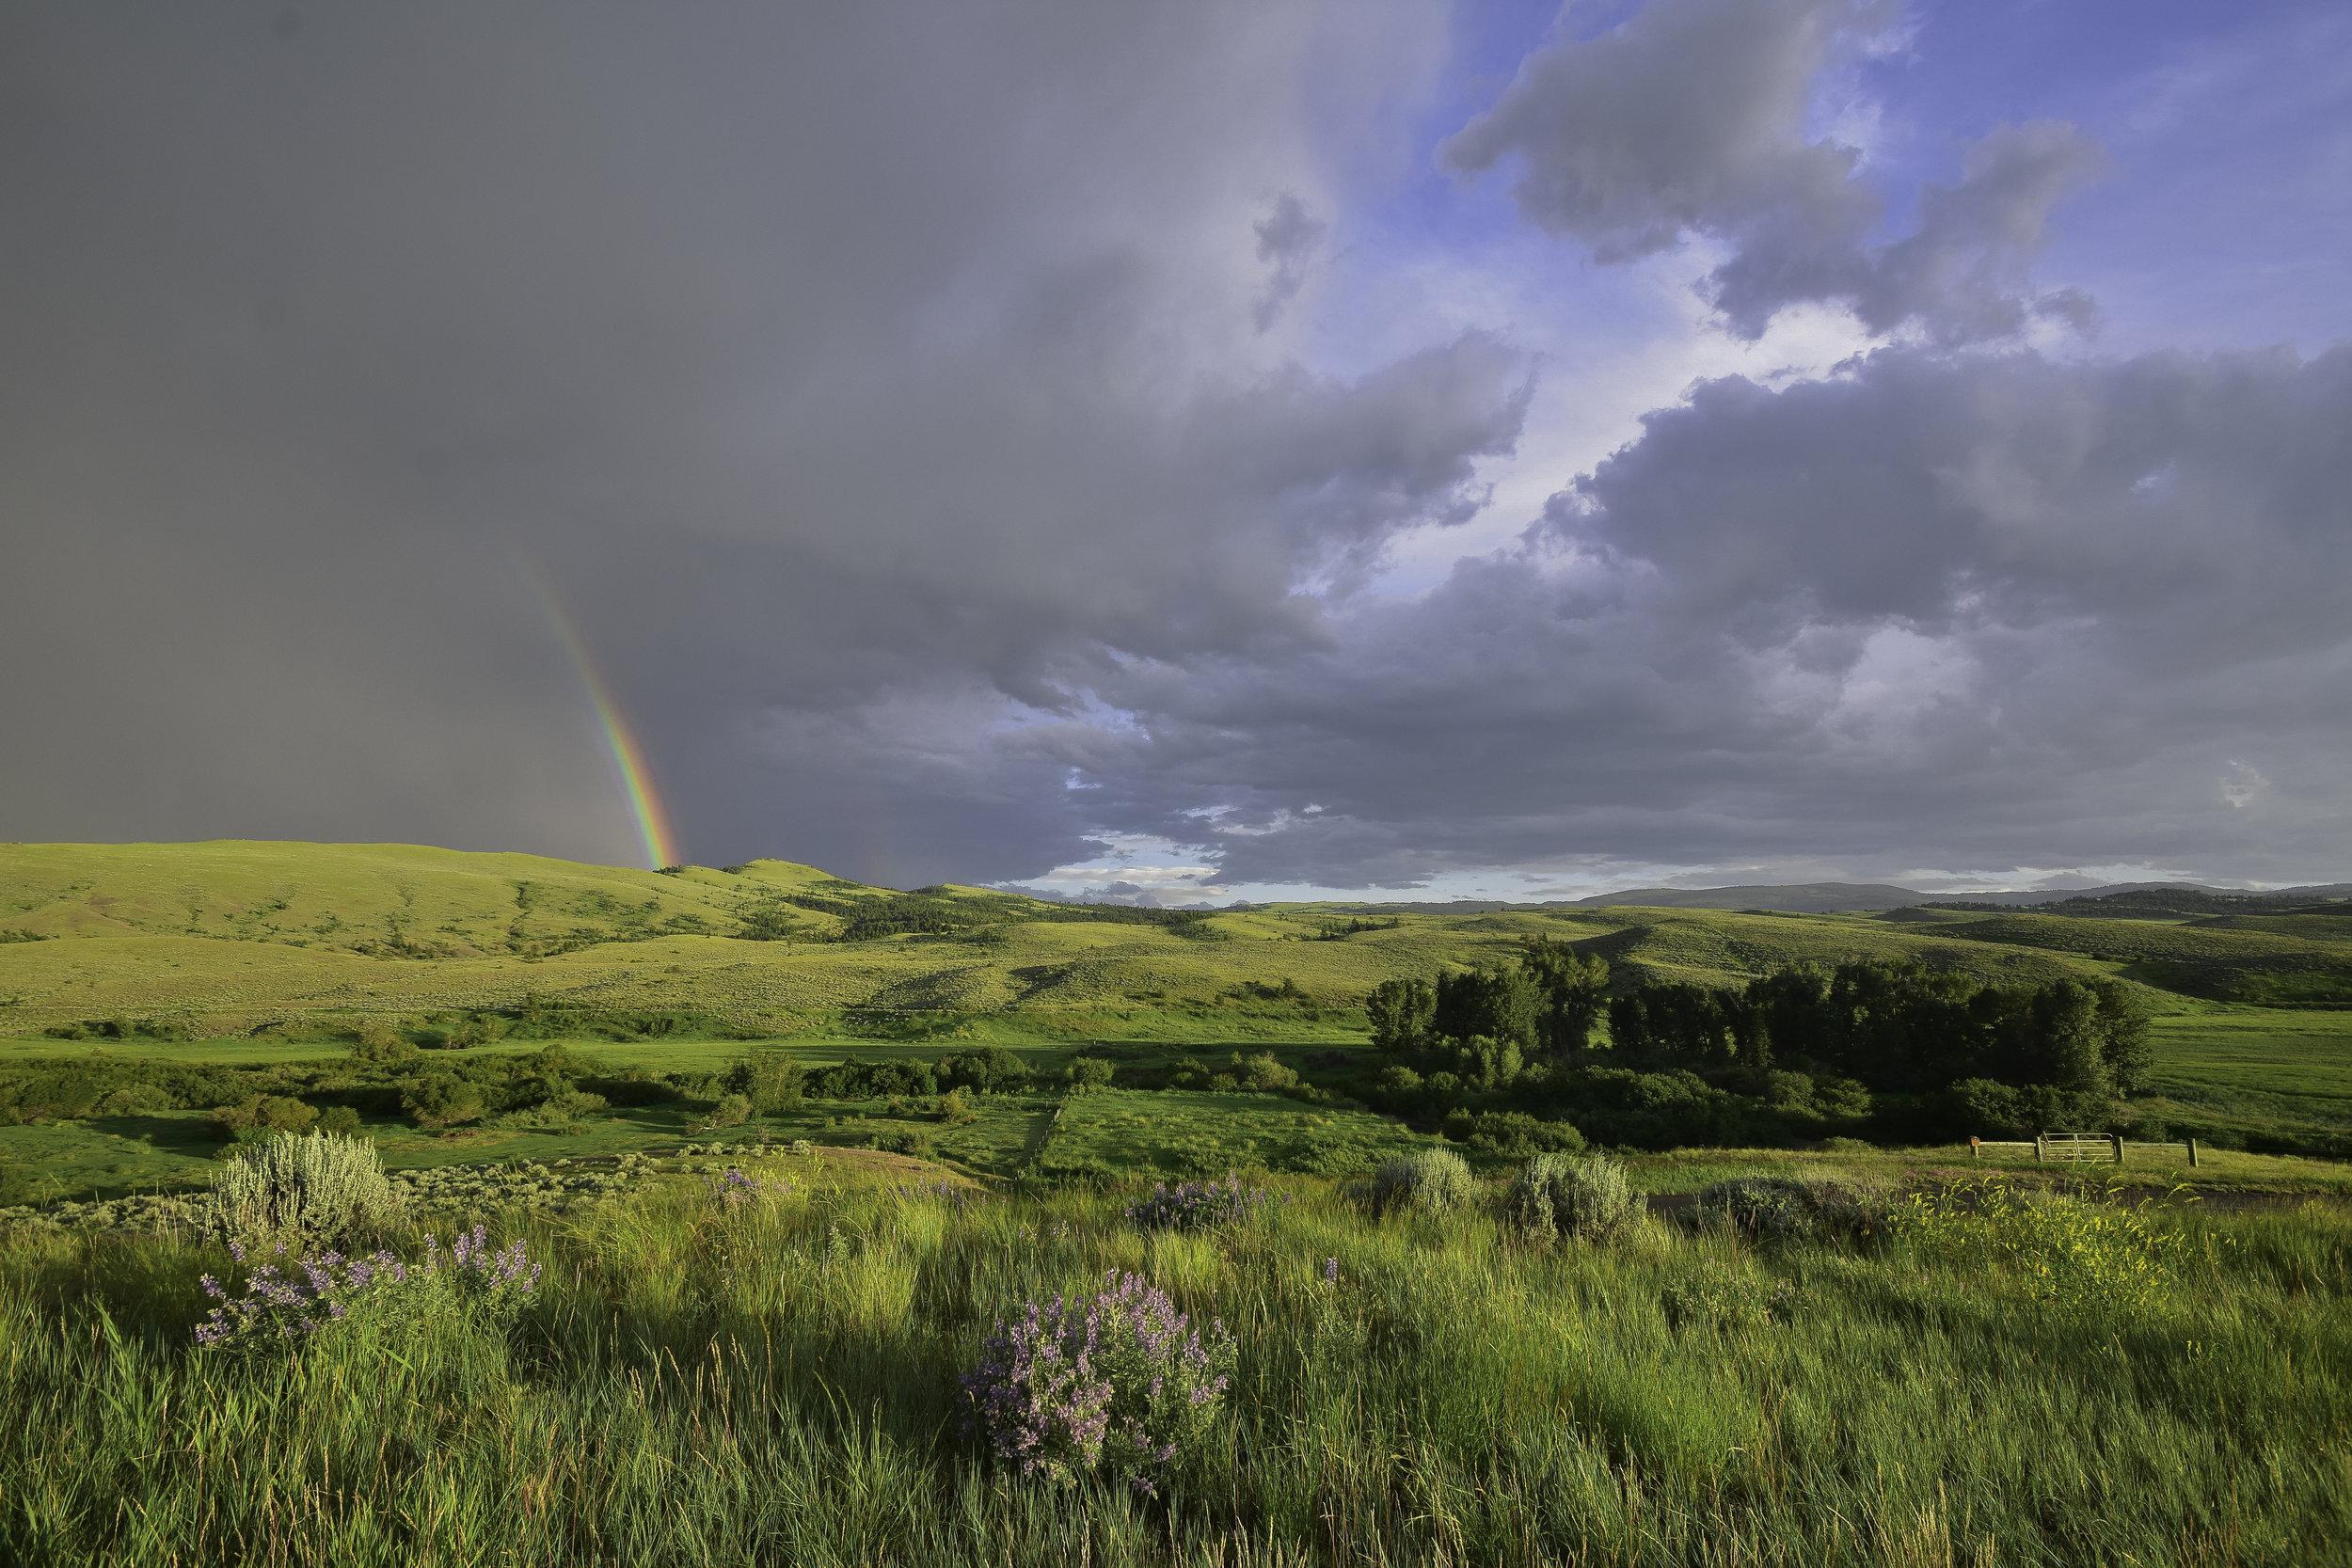 Chasing Rainbows / Jeremiah Cunningham.